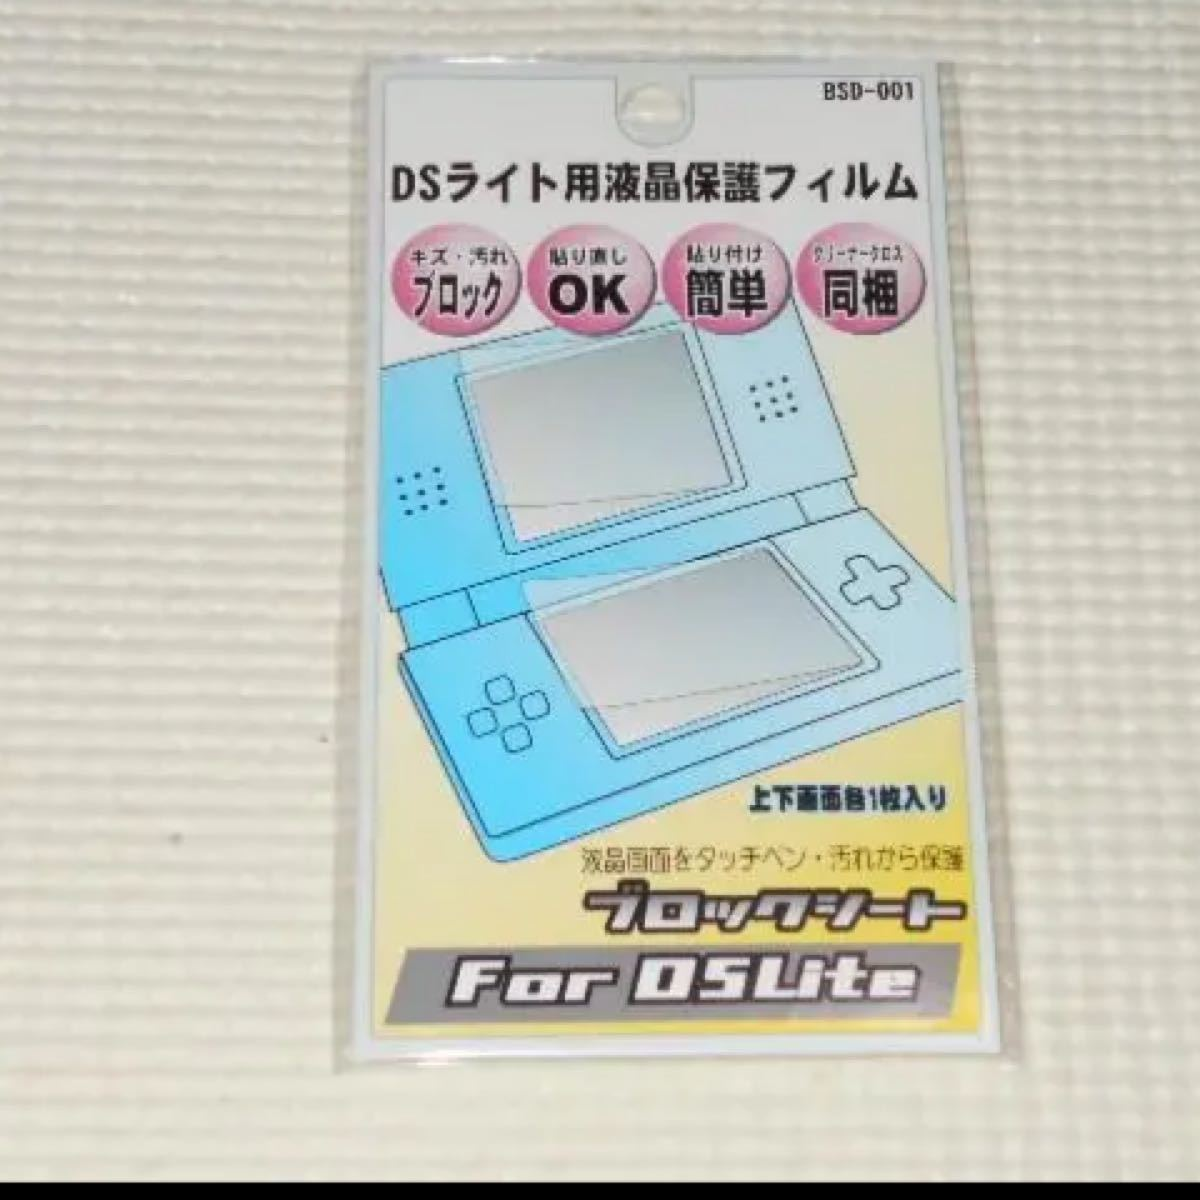 DS★DS Lite DSライト用液晶保護フィルム ブロックシート 上下画面各1枚入り クリーナークロス付★新品未開封